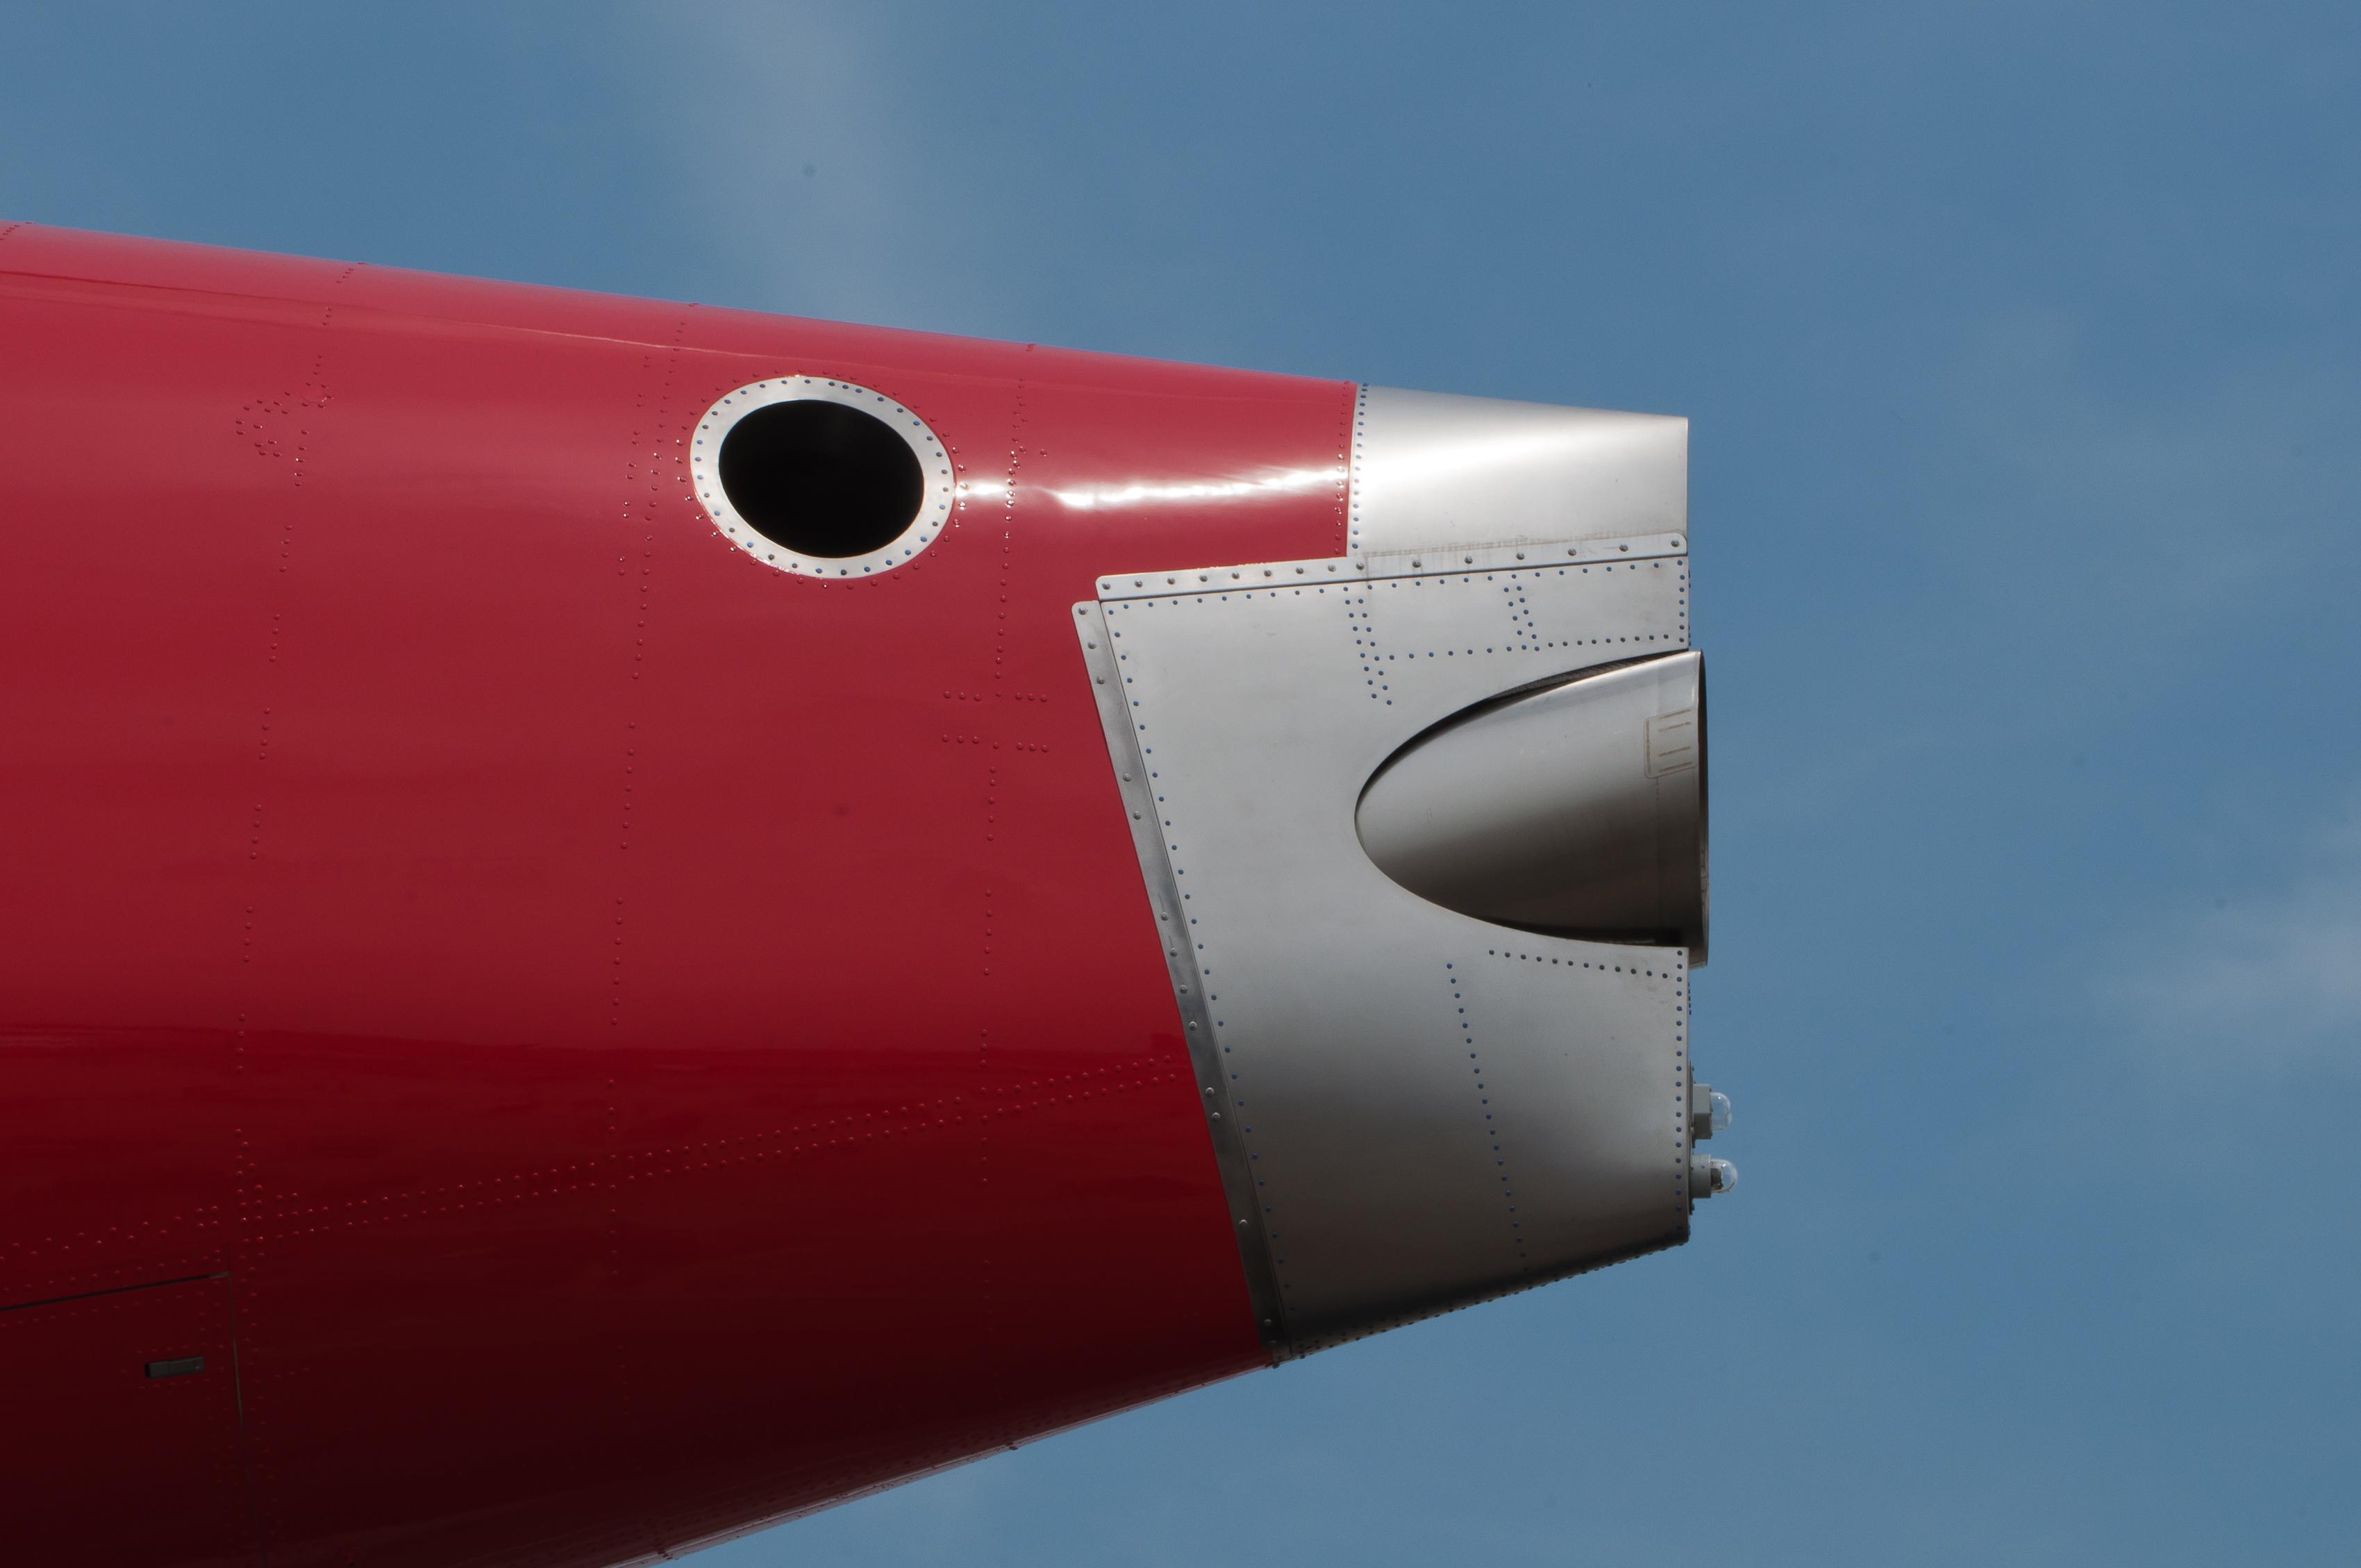 File:British Airways Airbus A380-841 F-WWSK PAS 2013 09